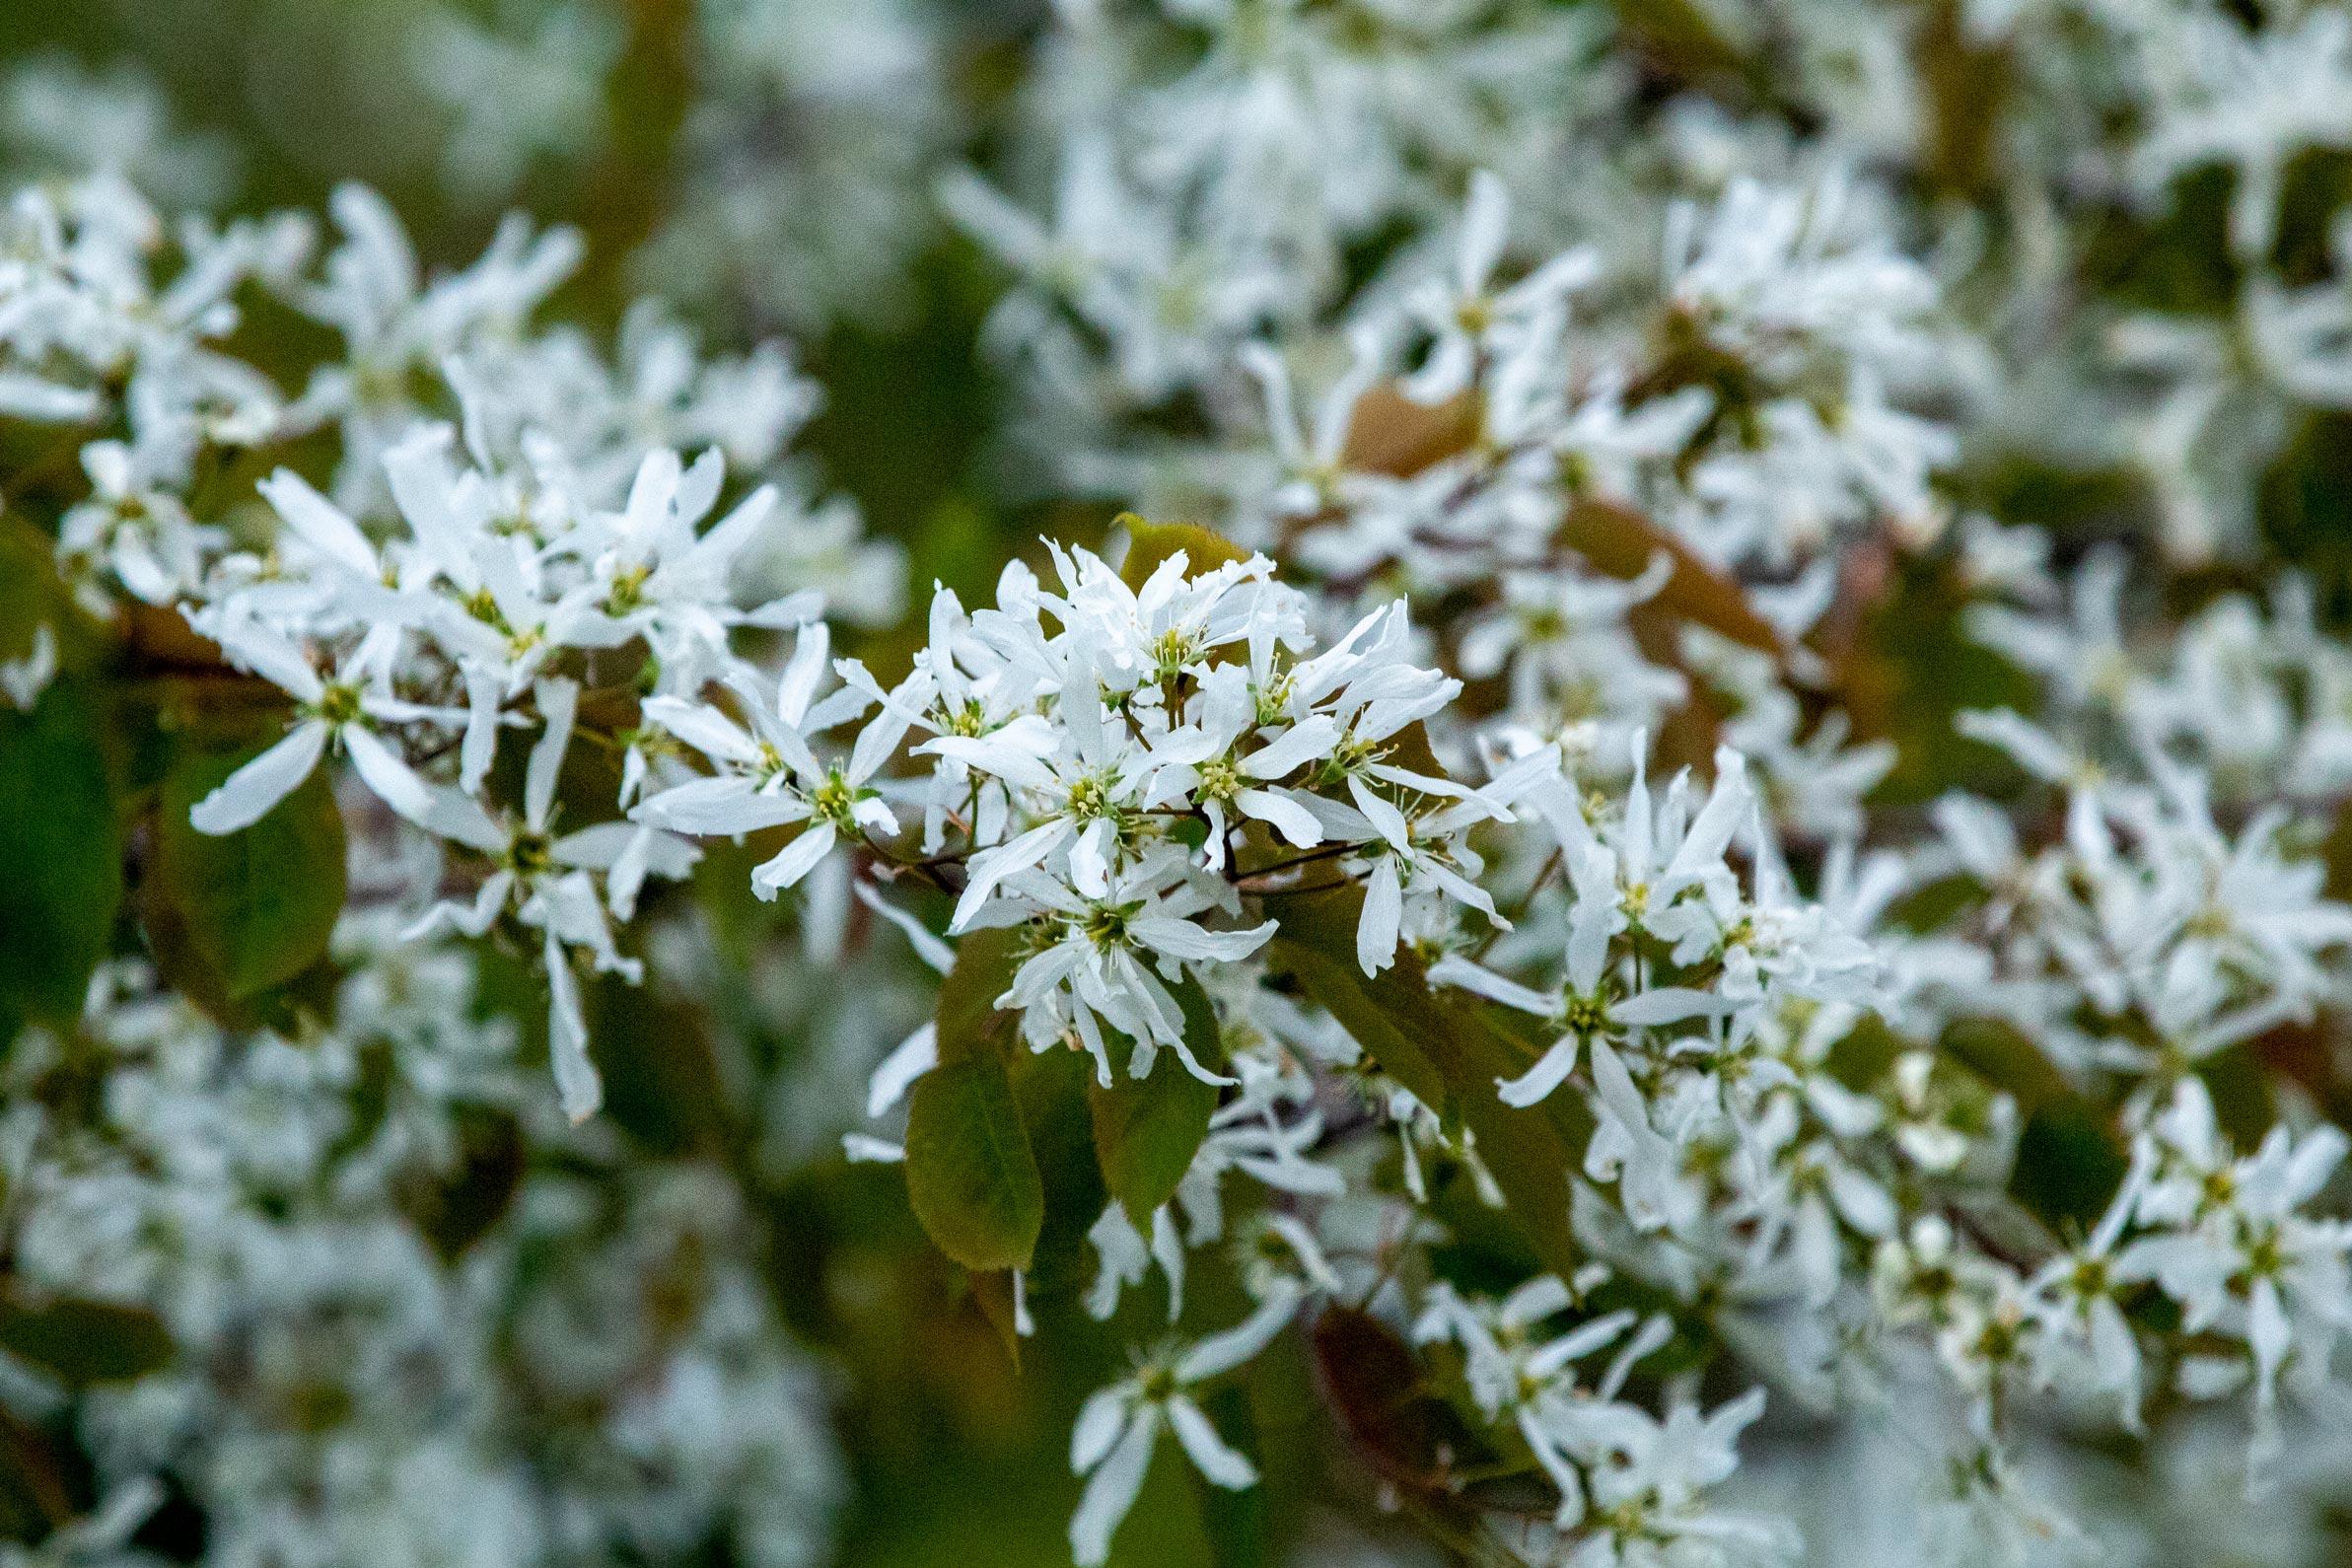 Tiny white flowers on a tree